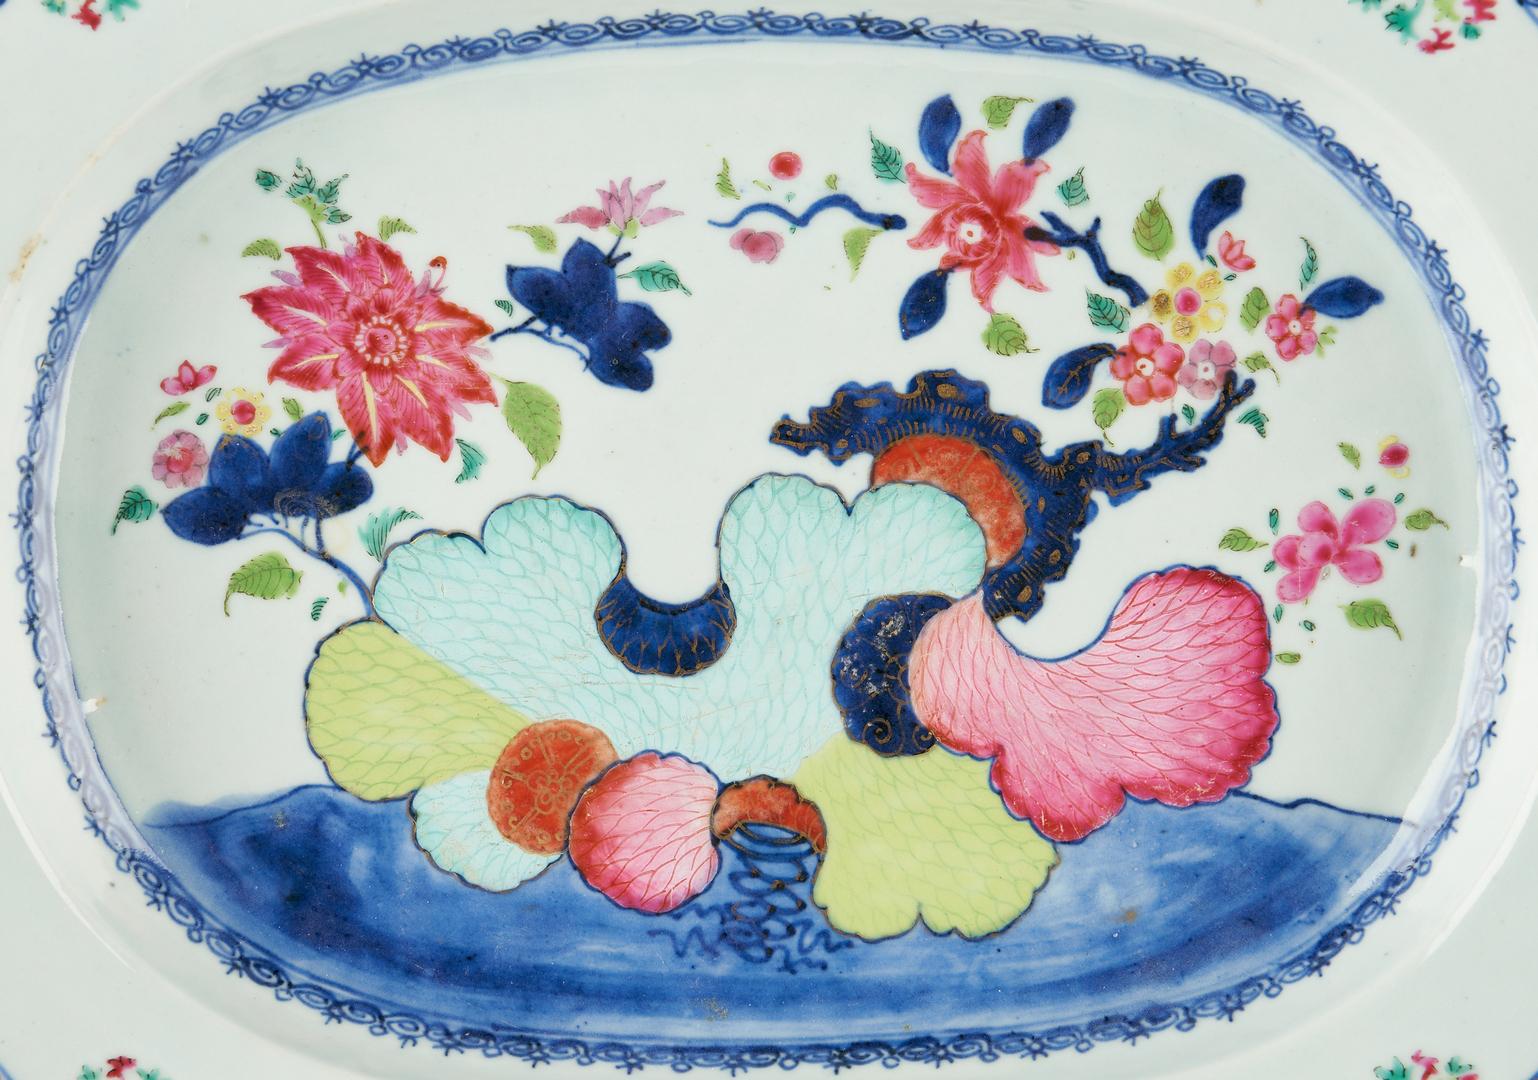 Lot 420: 2 Chinese Porcelain Lamps & Porcelain Platter, 3 items